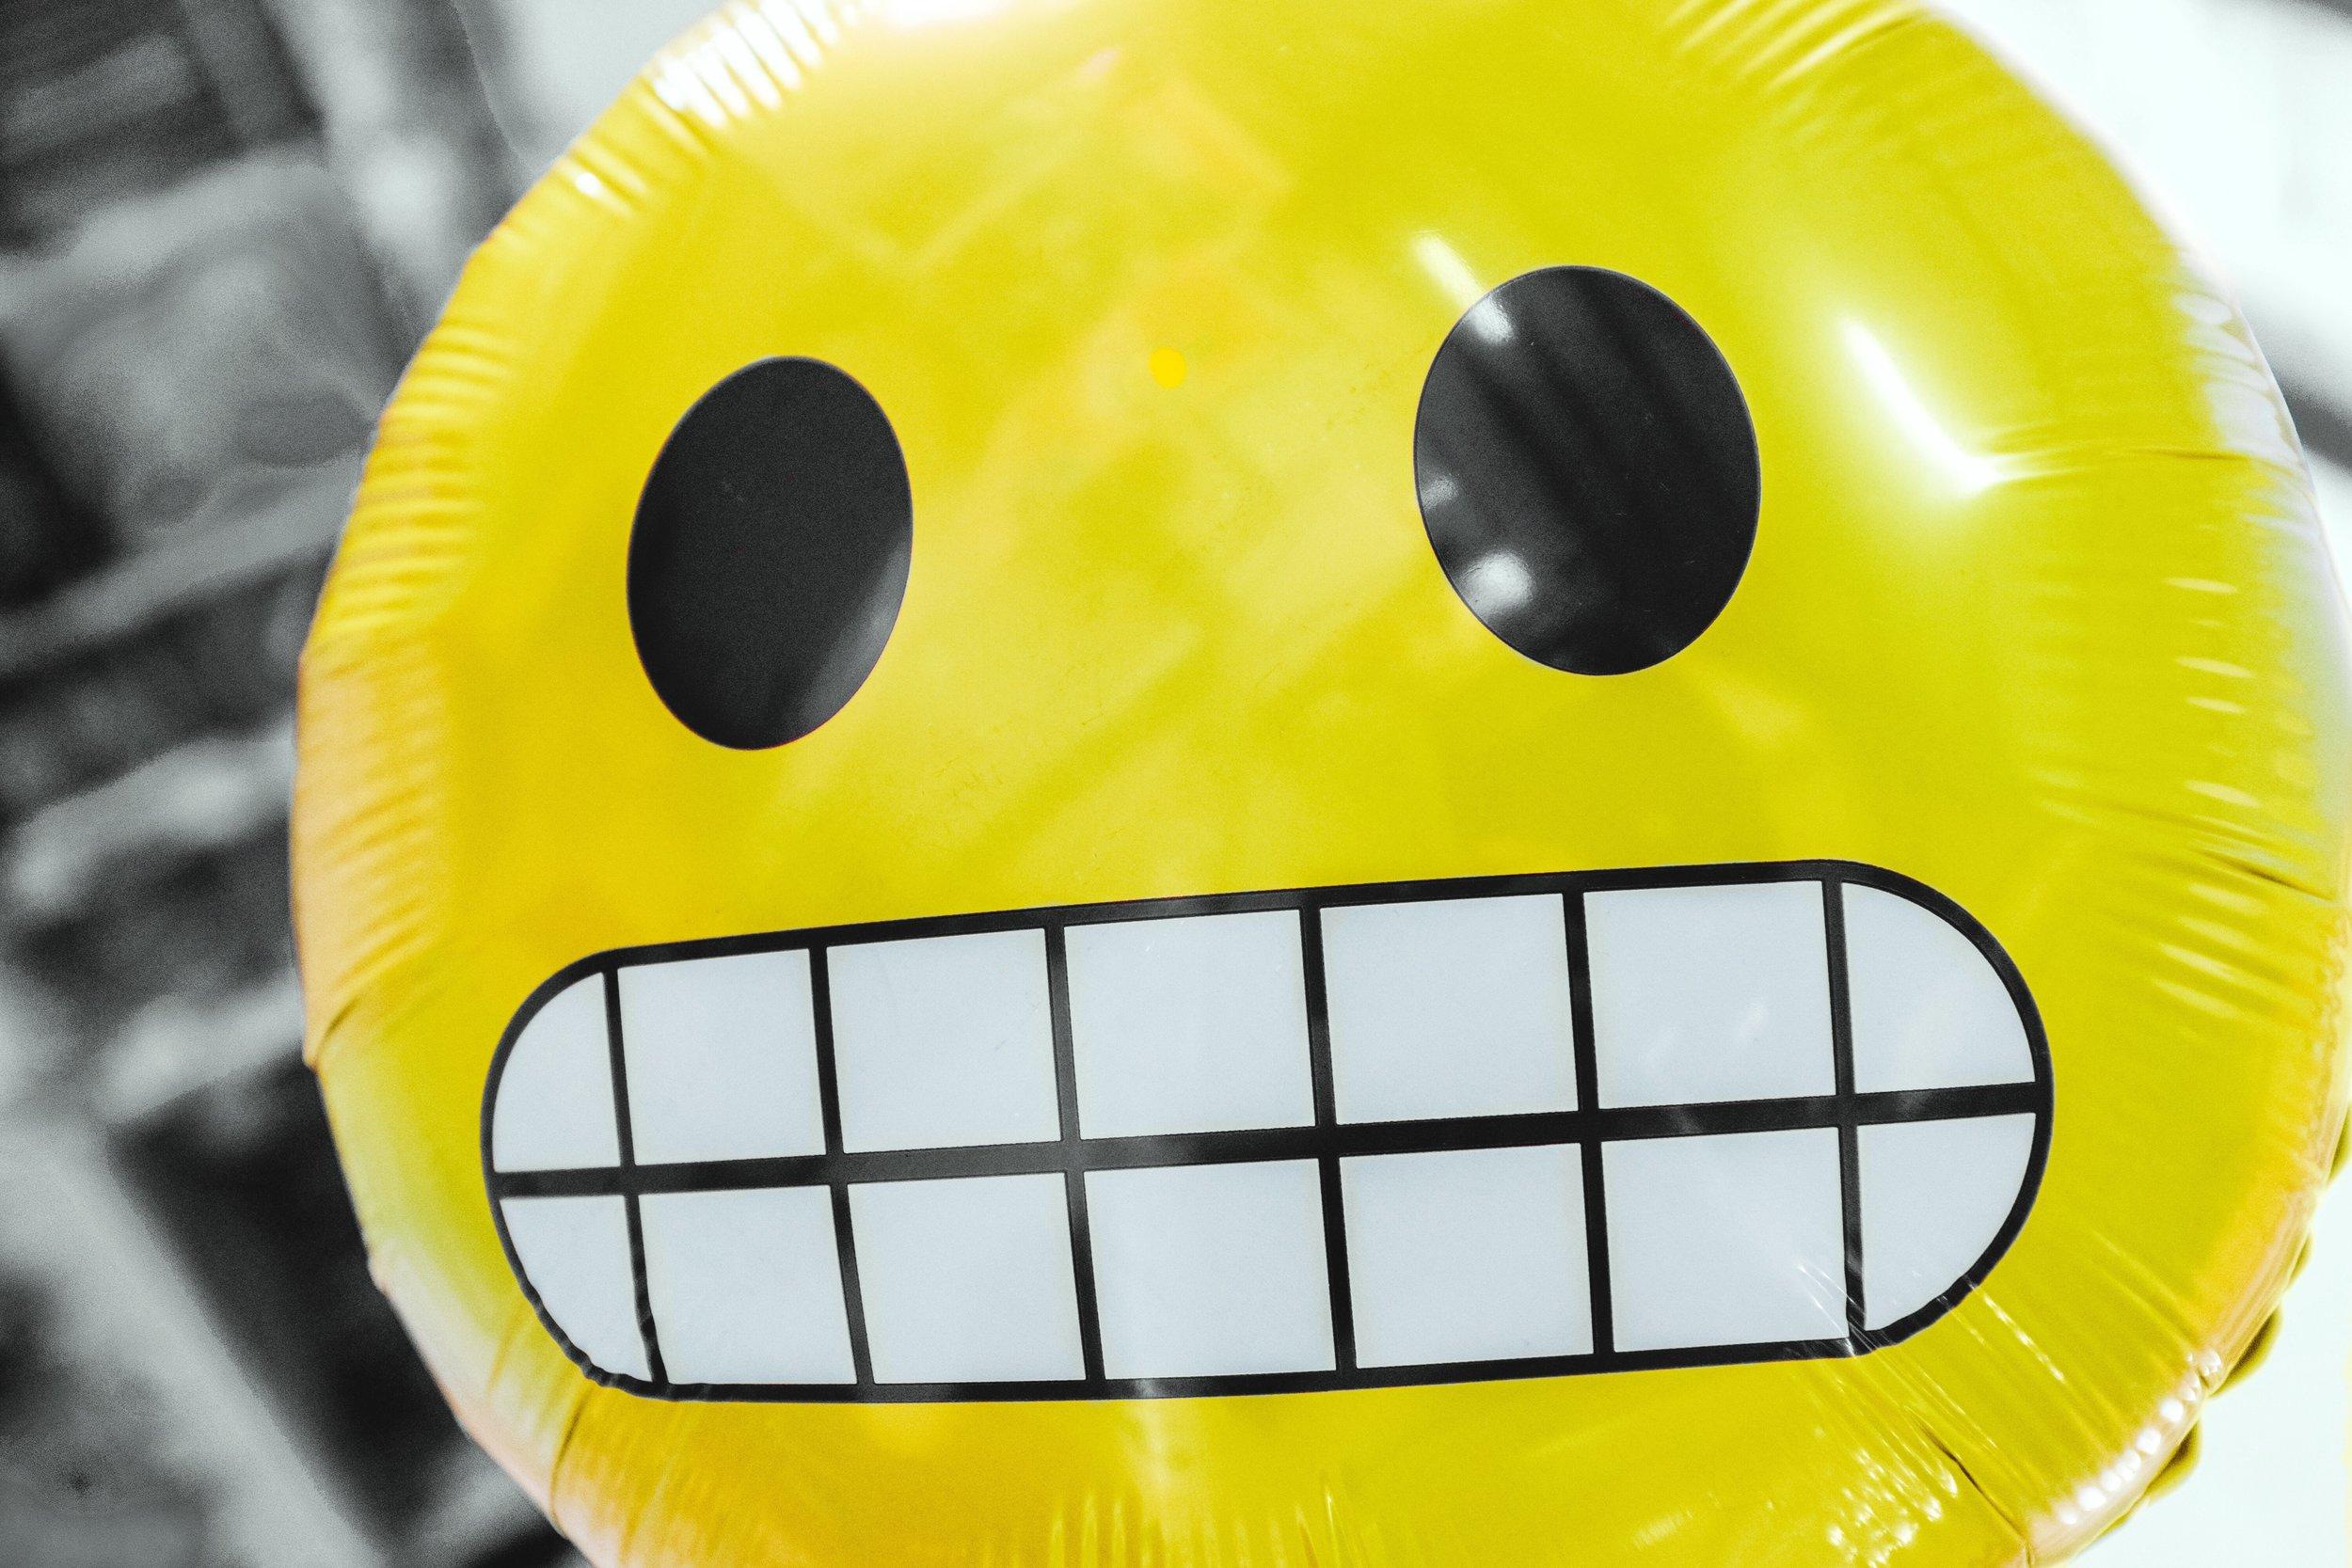 health-anxiety-negative-thinking-emoji.JPG